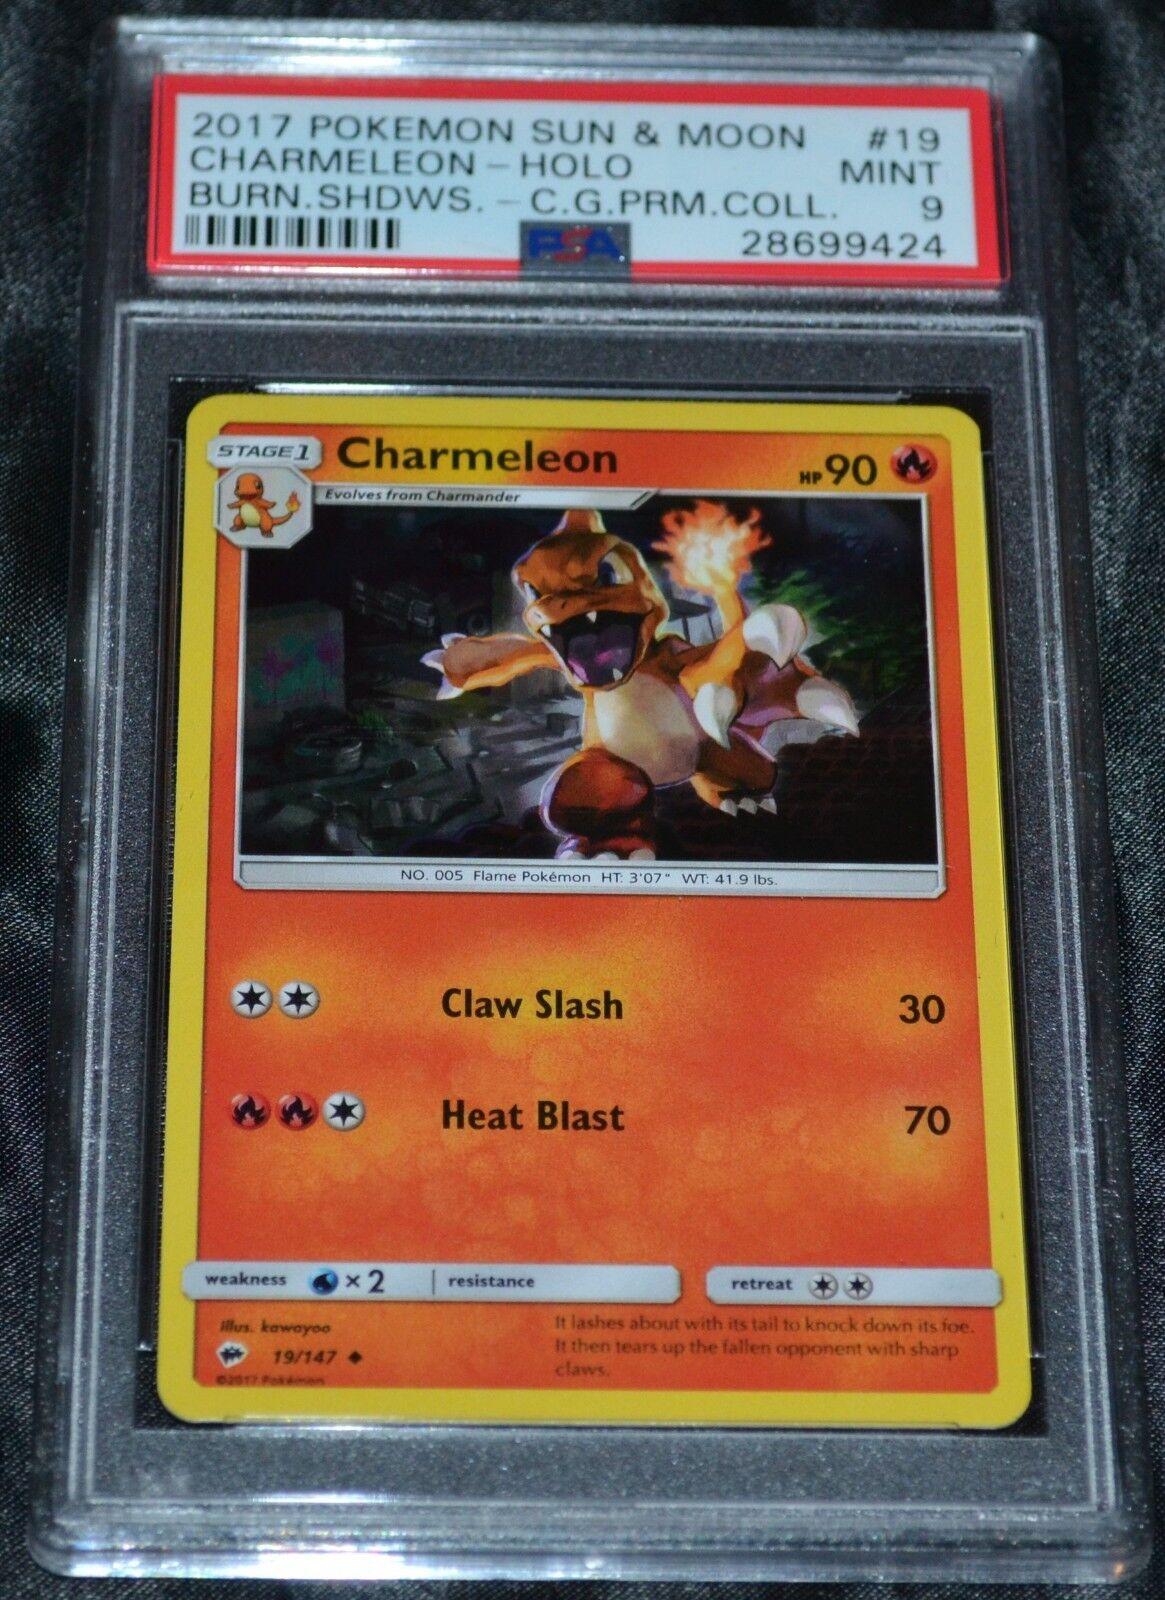 Holo - folie charmeleon charizard erstklassige sammlung set pokémon - karten - psa - 9.